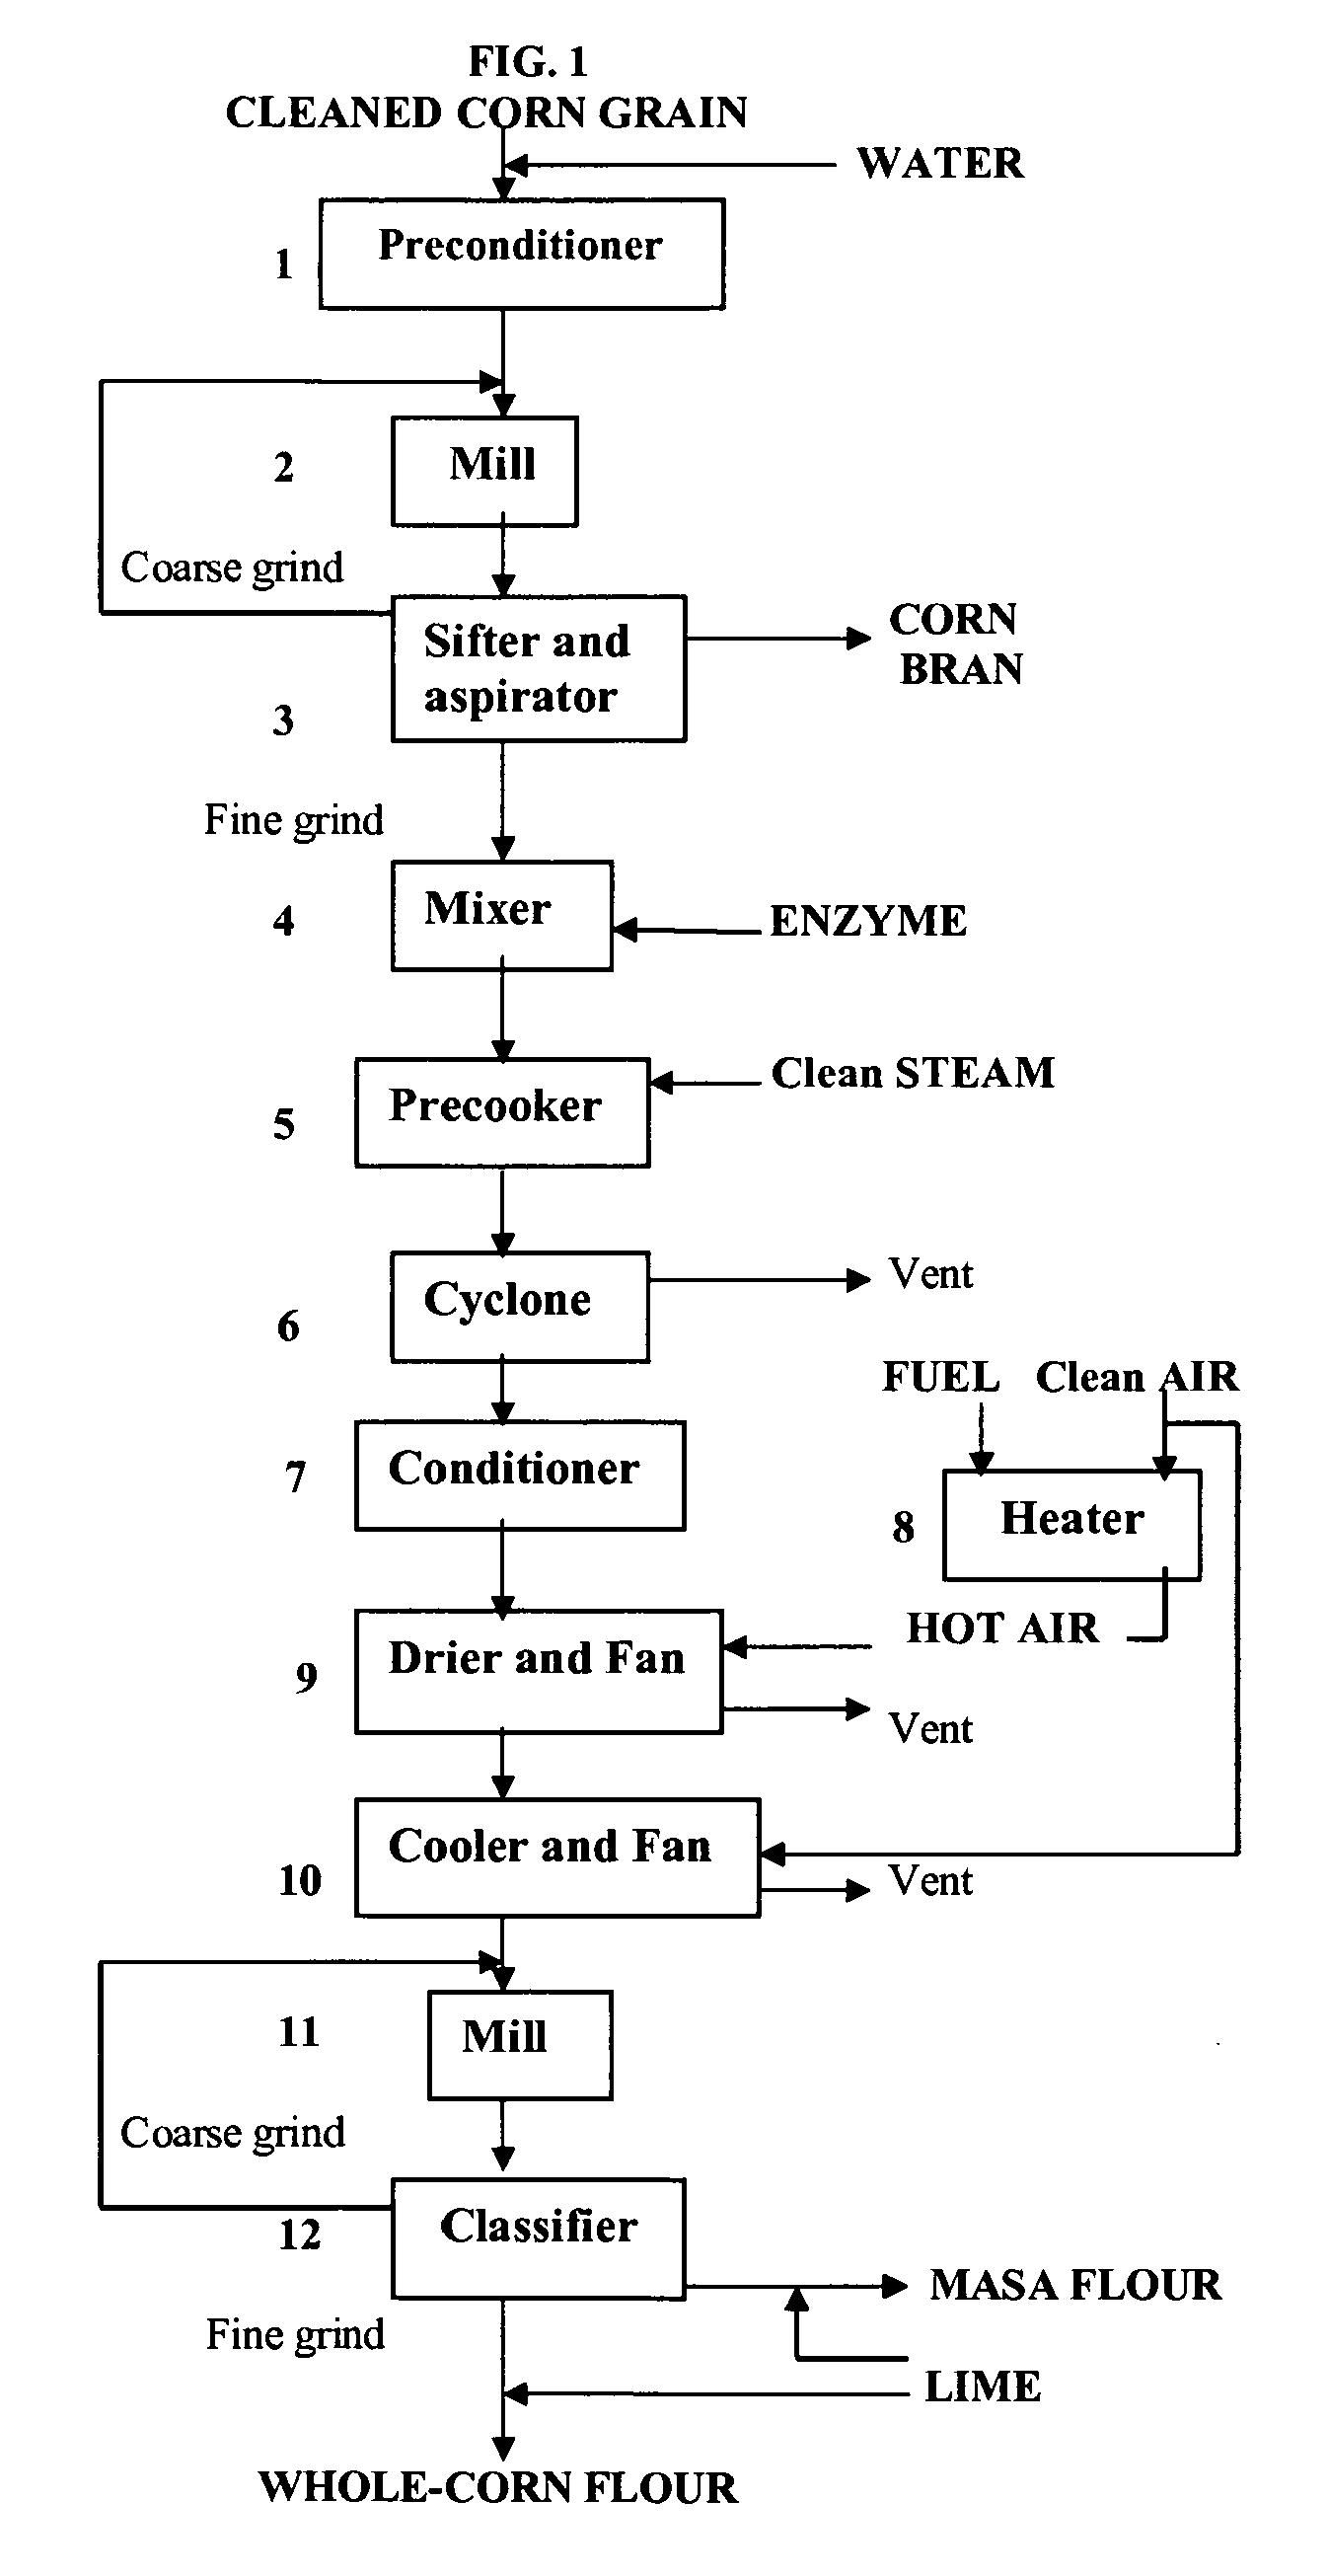 yakult flow chart college paper academic writing service rh fyhomeworkmlpx afvallenbuik info Process Flow Diagram Template Application Process Flow Diagram